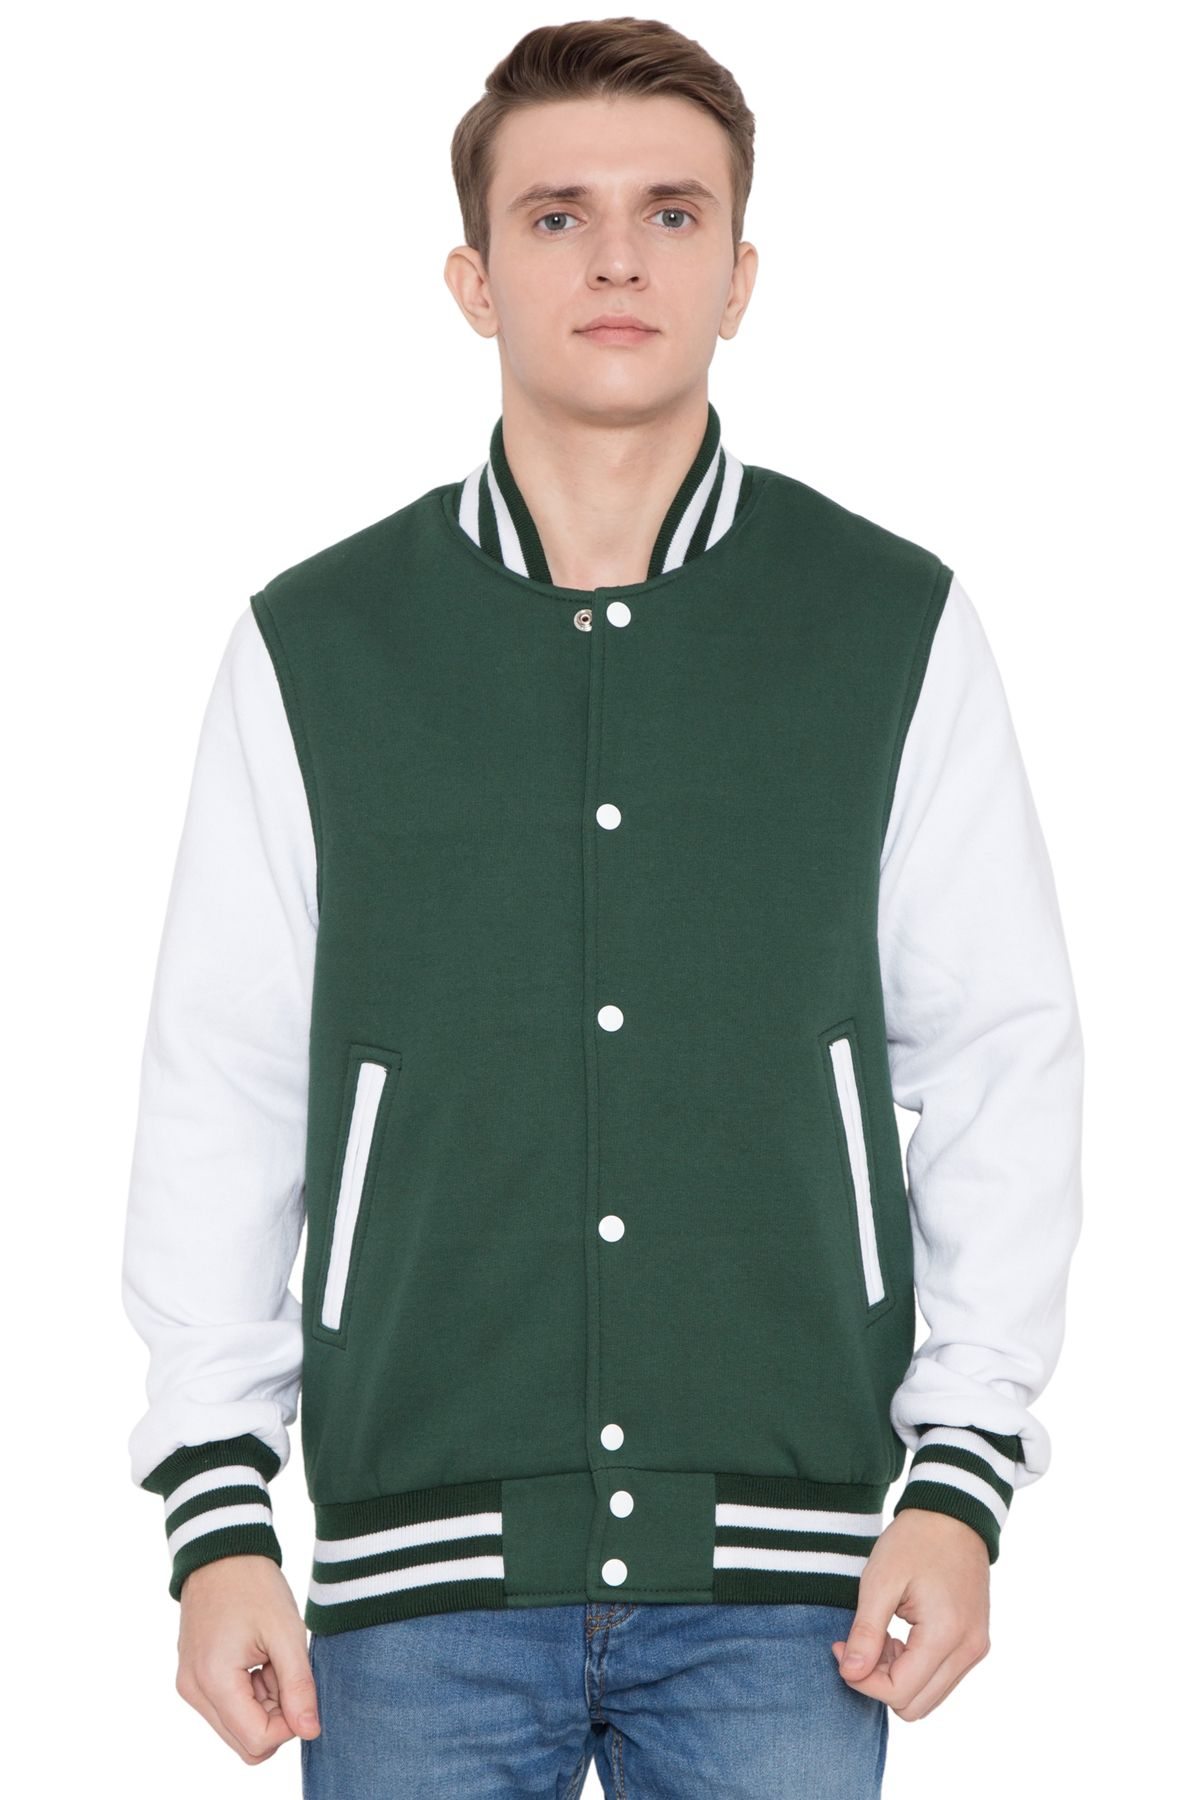 Caliber USA help to create leather sleeves varsity jacket